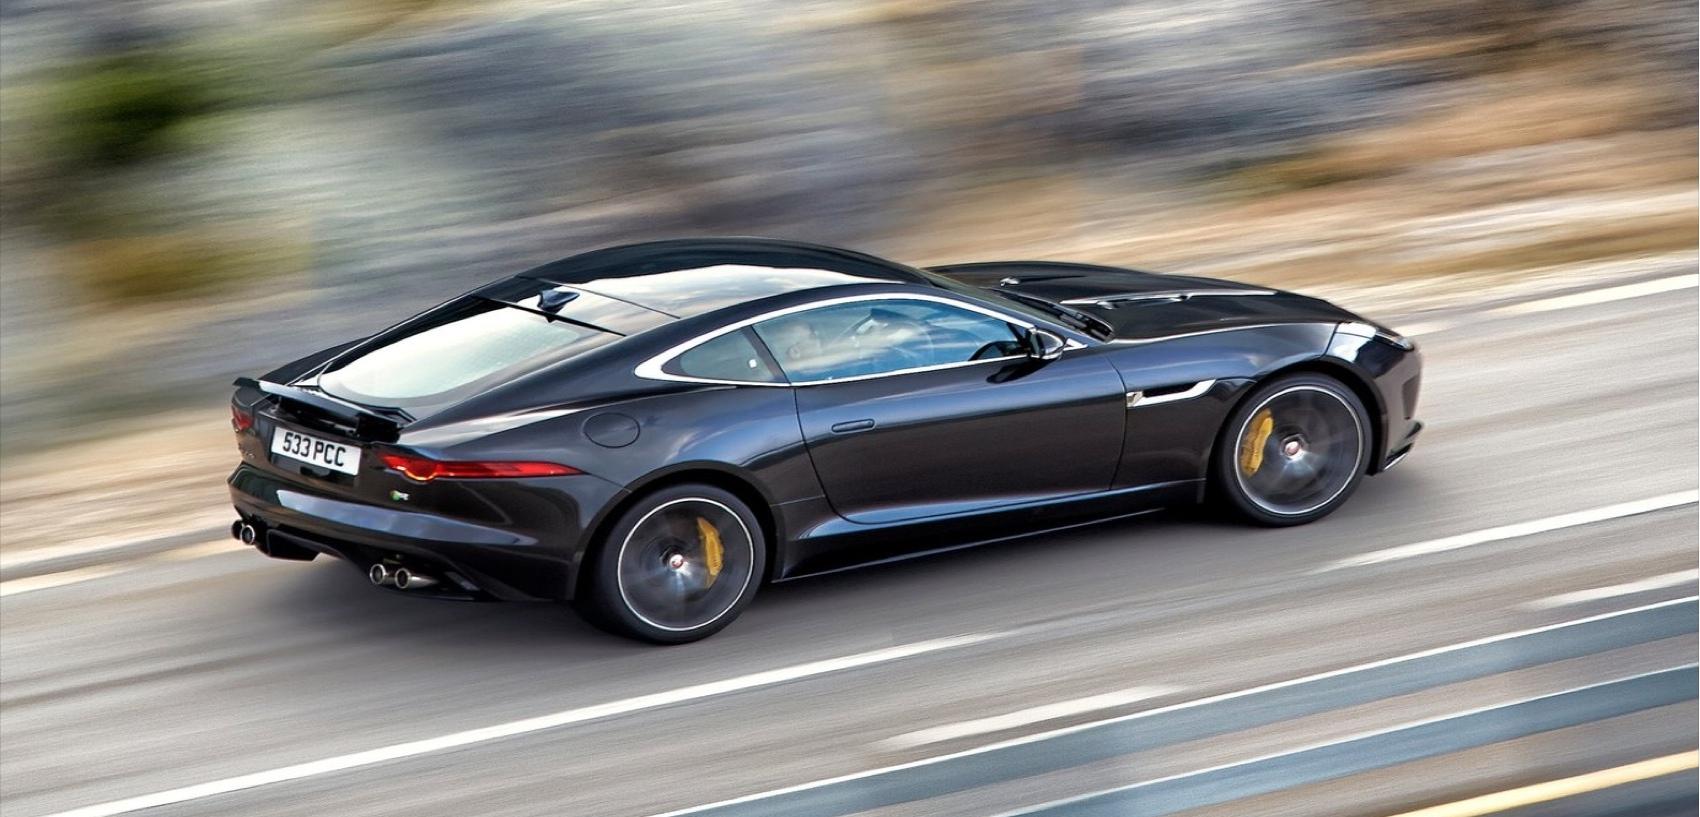 Jaguar Xk Replacement 2017 >> Jaguar Xk To Be Replaced By Larger Xj Coupe Autoevolution